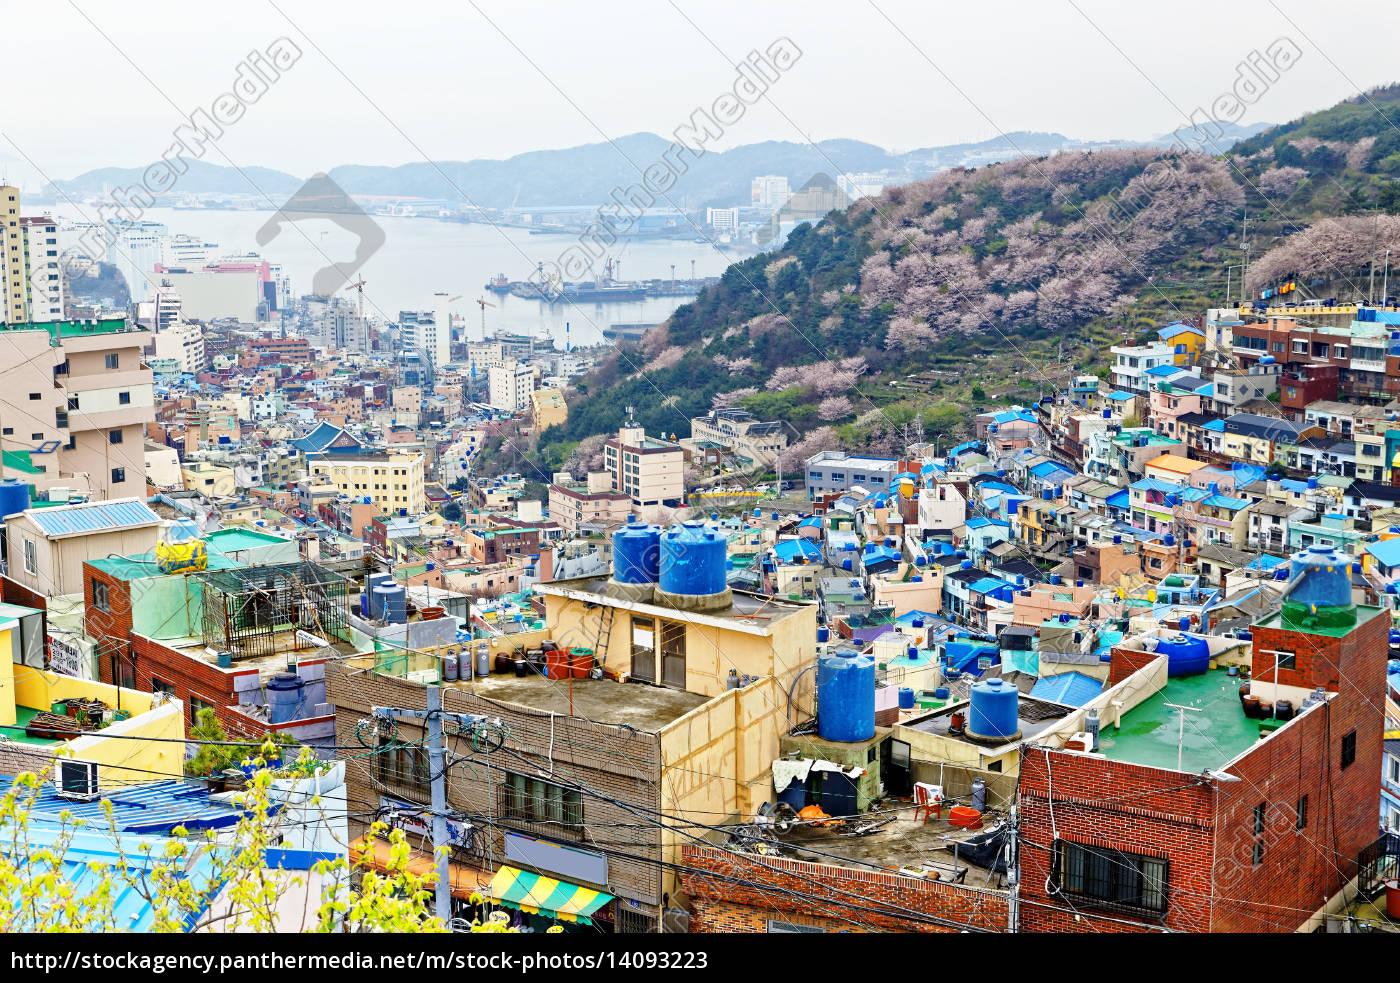 gamcheon, culture, village, in, south, korea. - 14093223